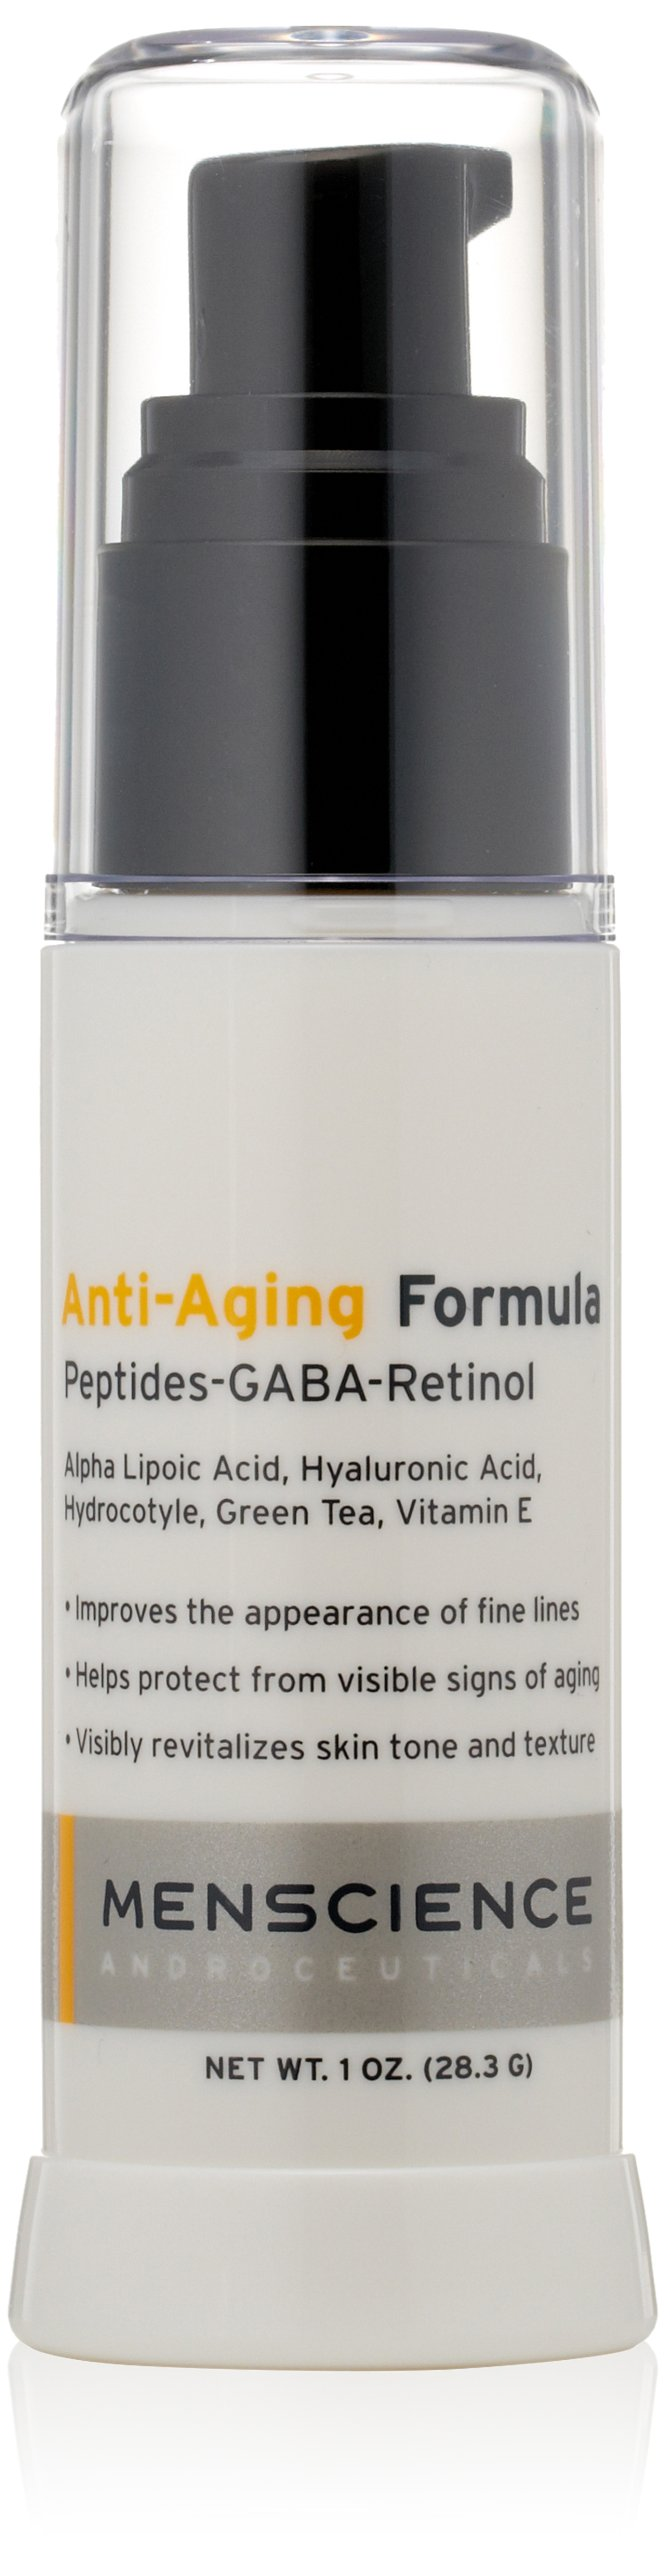 MenScience Androceuticals Anti-Aging Formula, 1 oz.